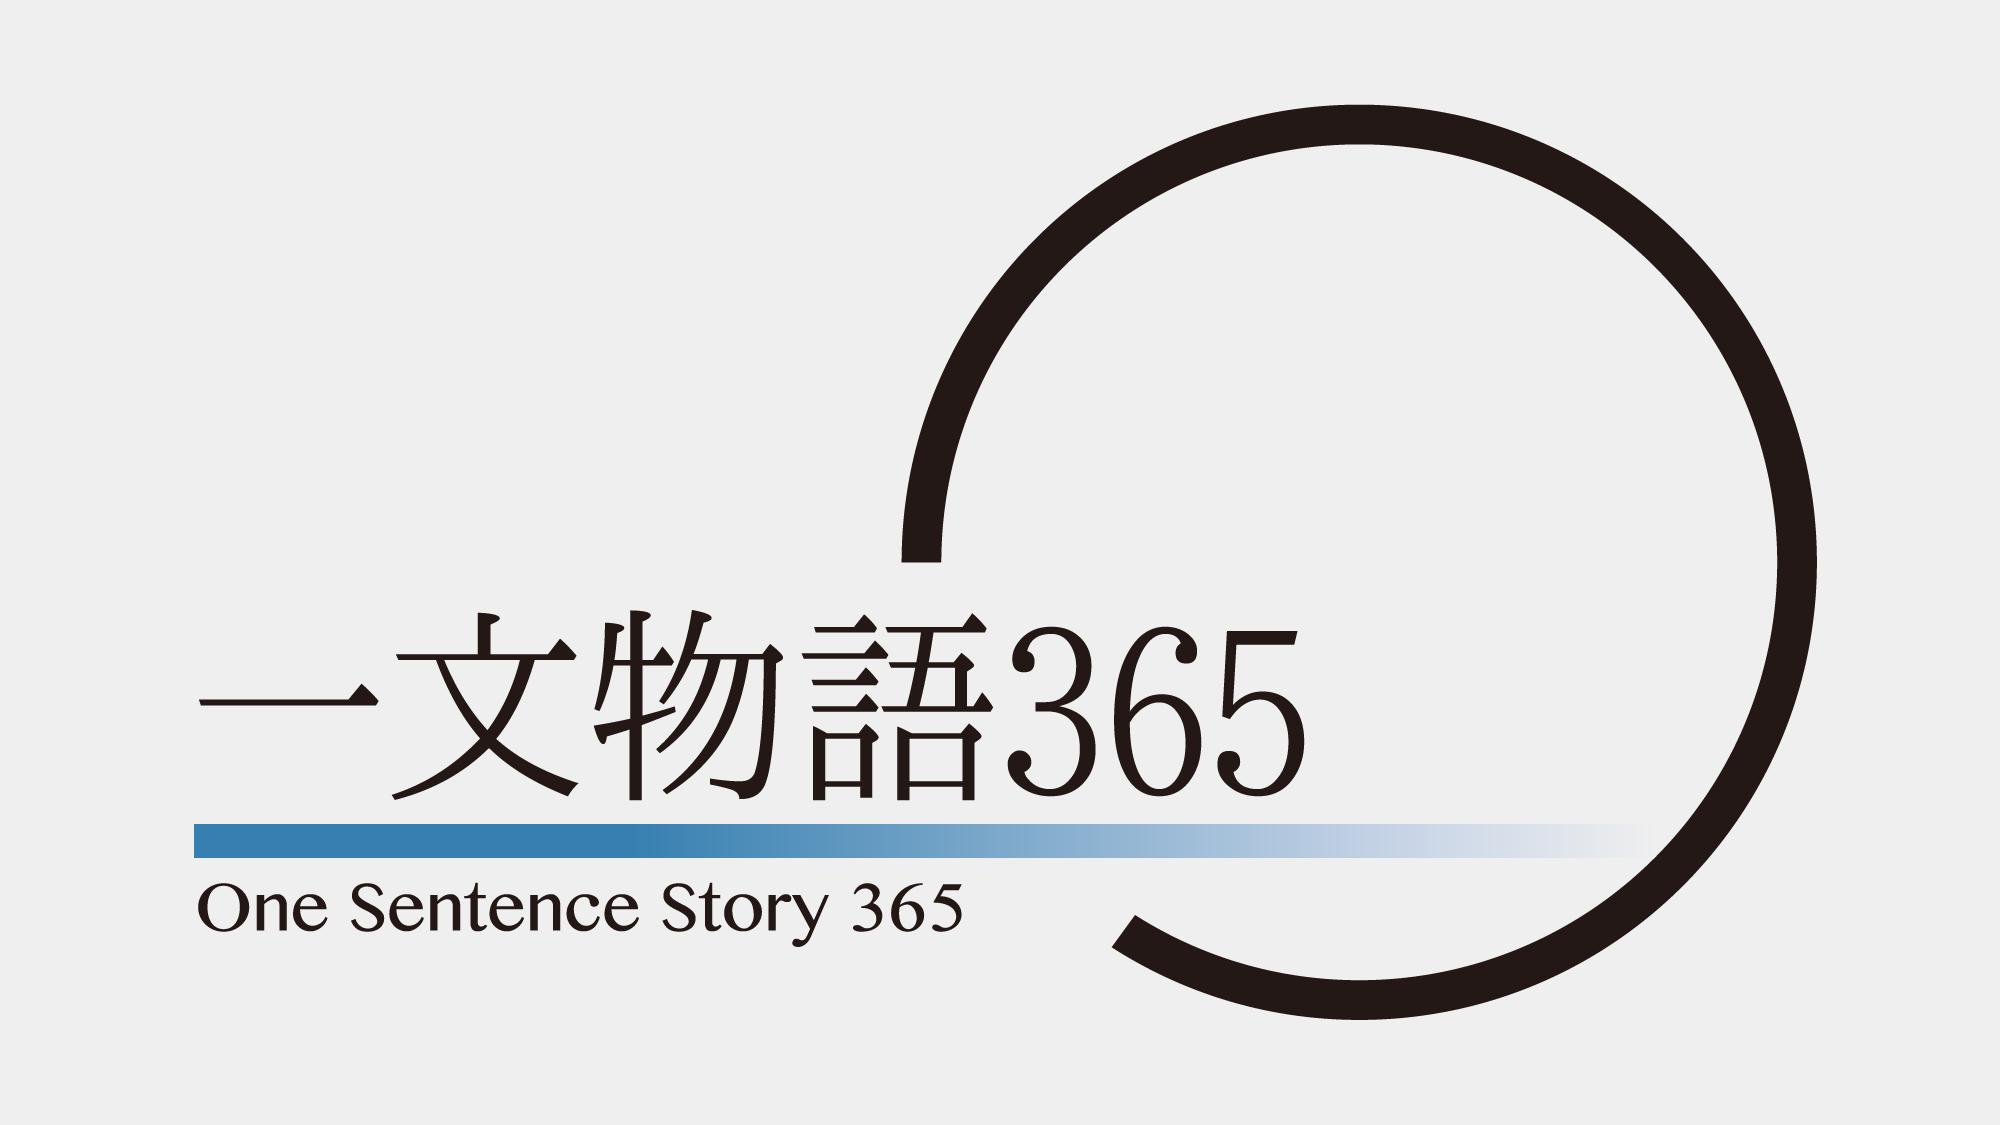 一文物語365 One Sentence story